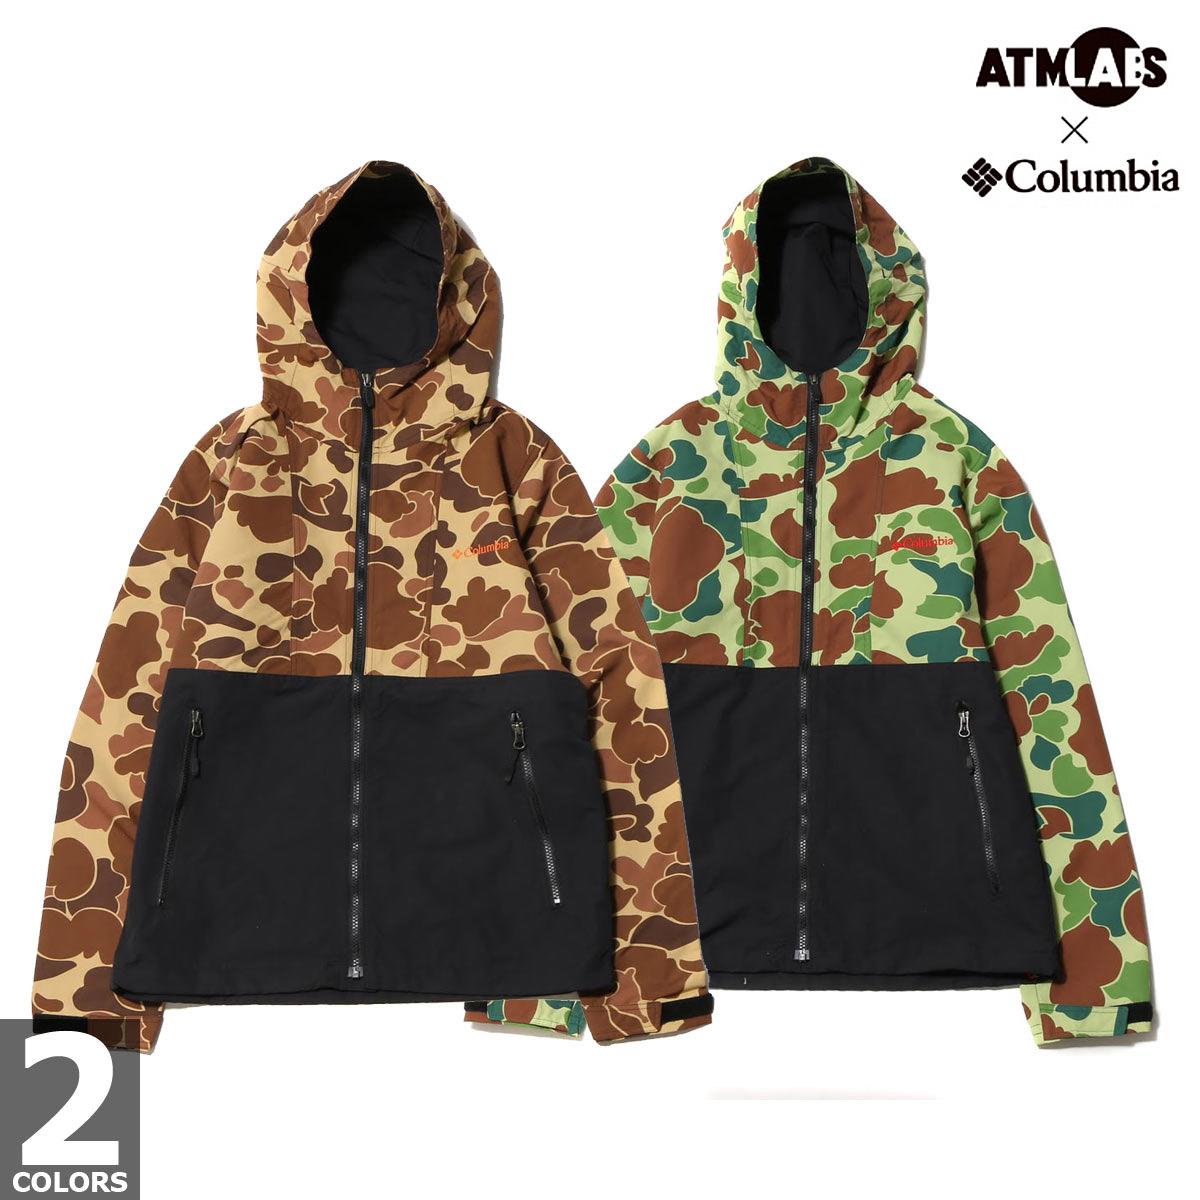 Columbia ATMOS LAB Tyger Sweep(TM) Jacket (コロンビア アトモスラボ タイガースイープ(TM) ジャケット)2色展開【メンズ ジャケット】17SS-S